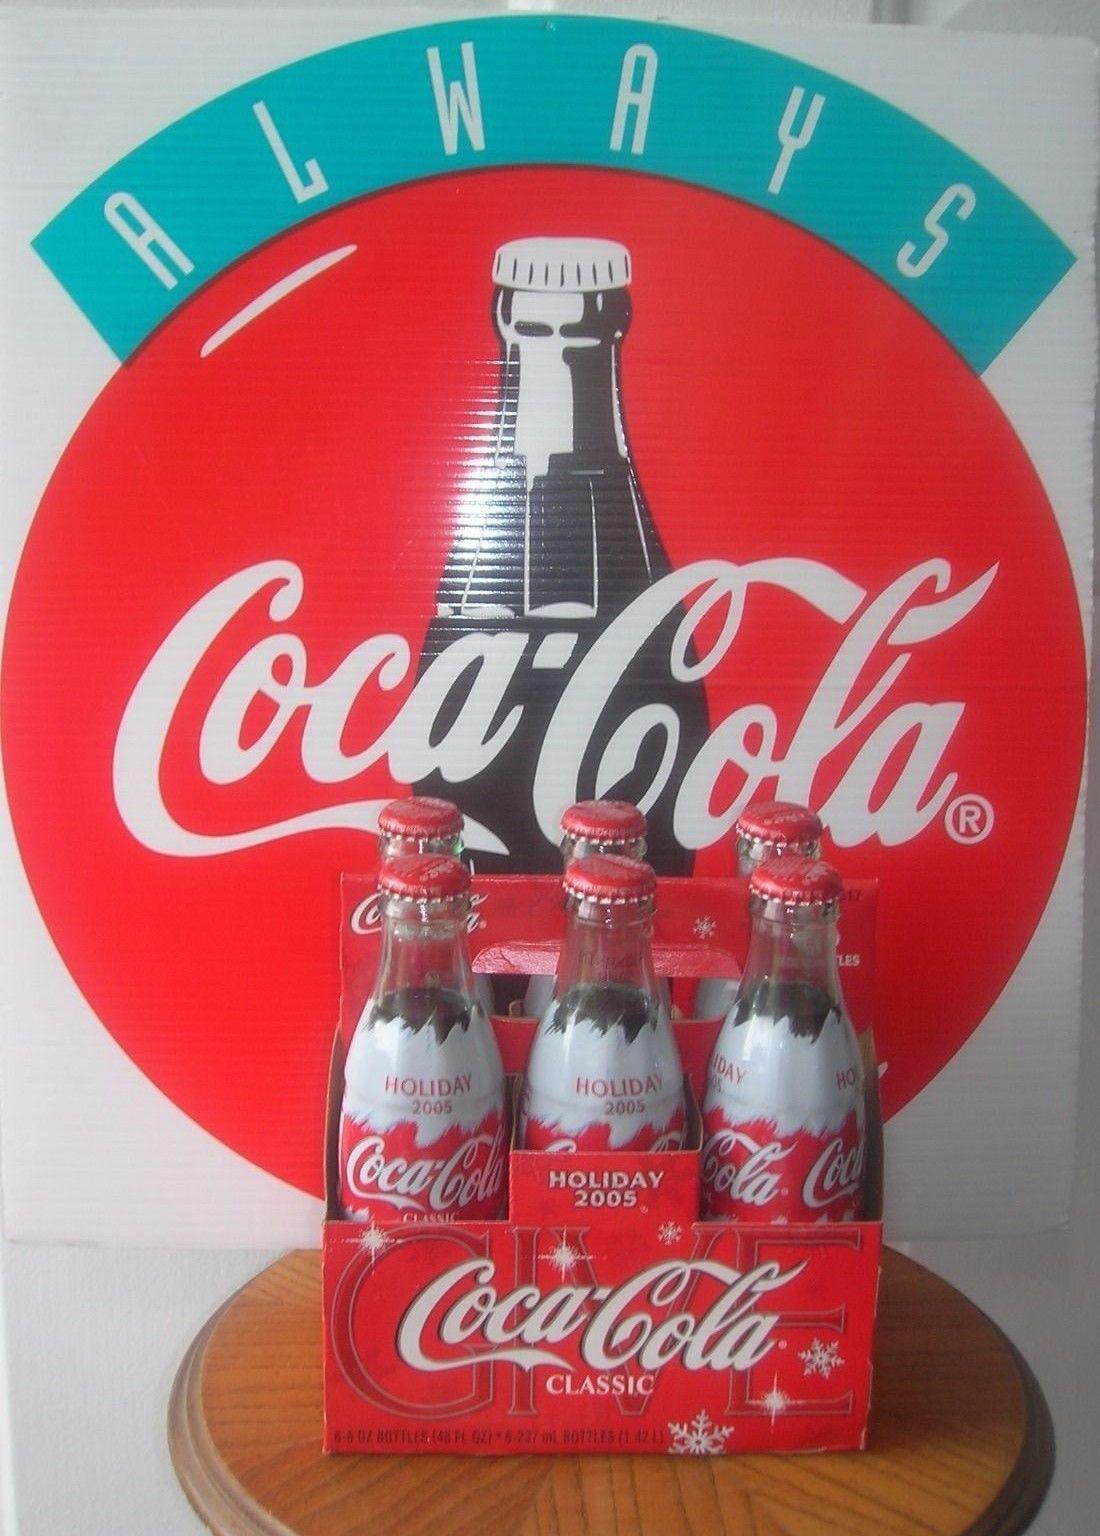 Coca Cola Polar Bear Holiday 2005 Coke 6 Pack Bottles